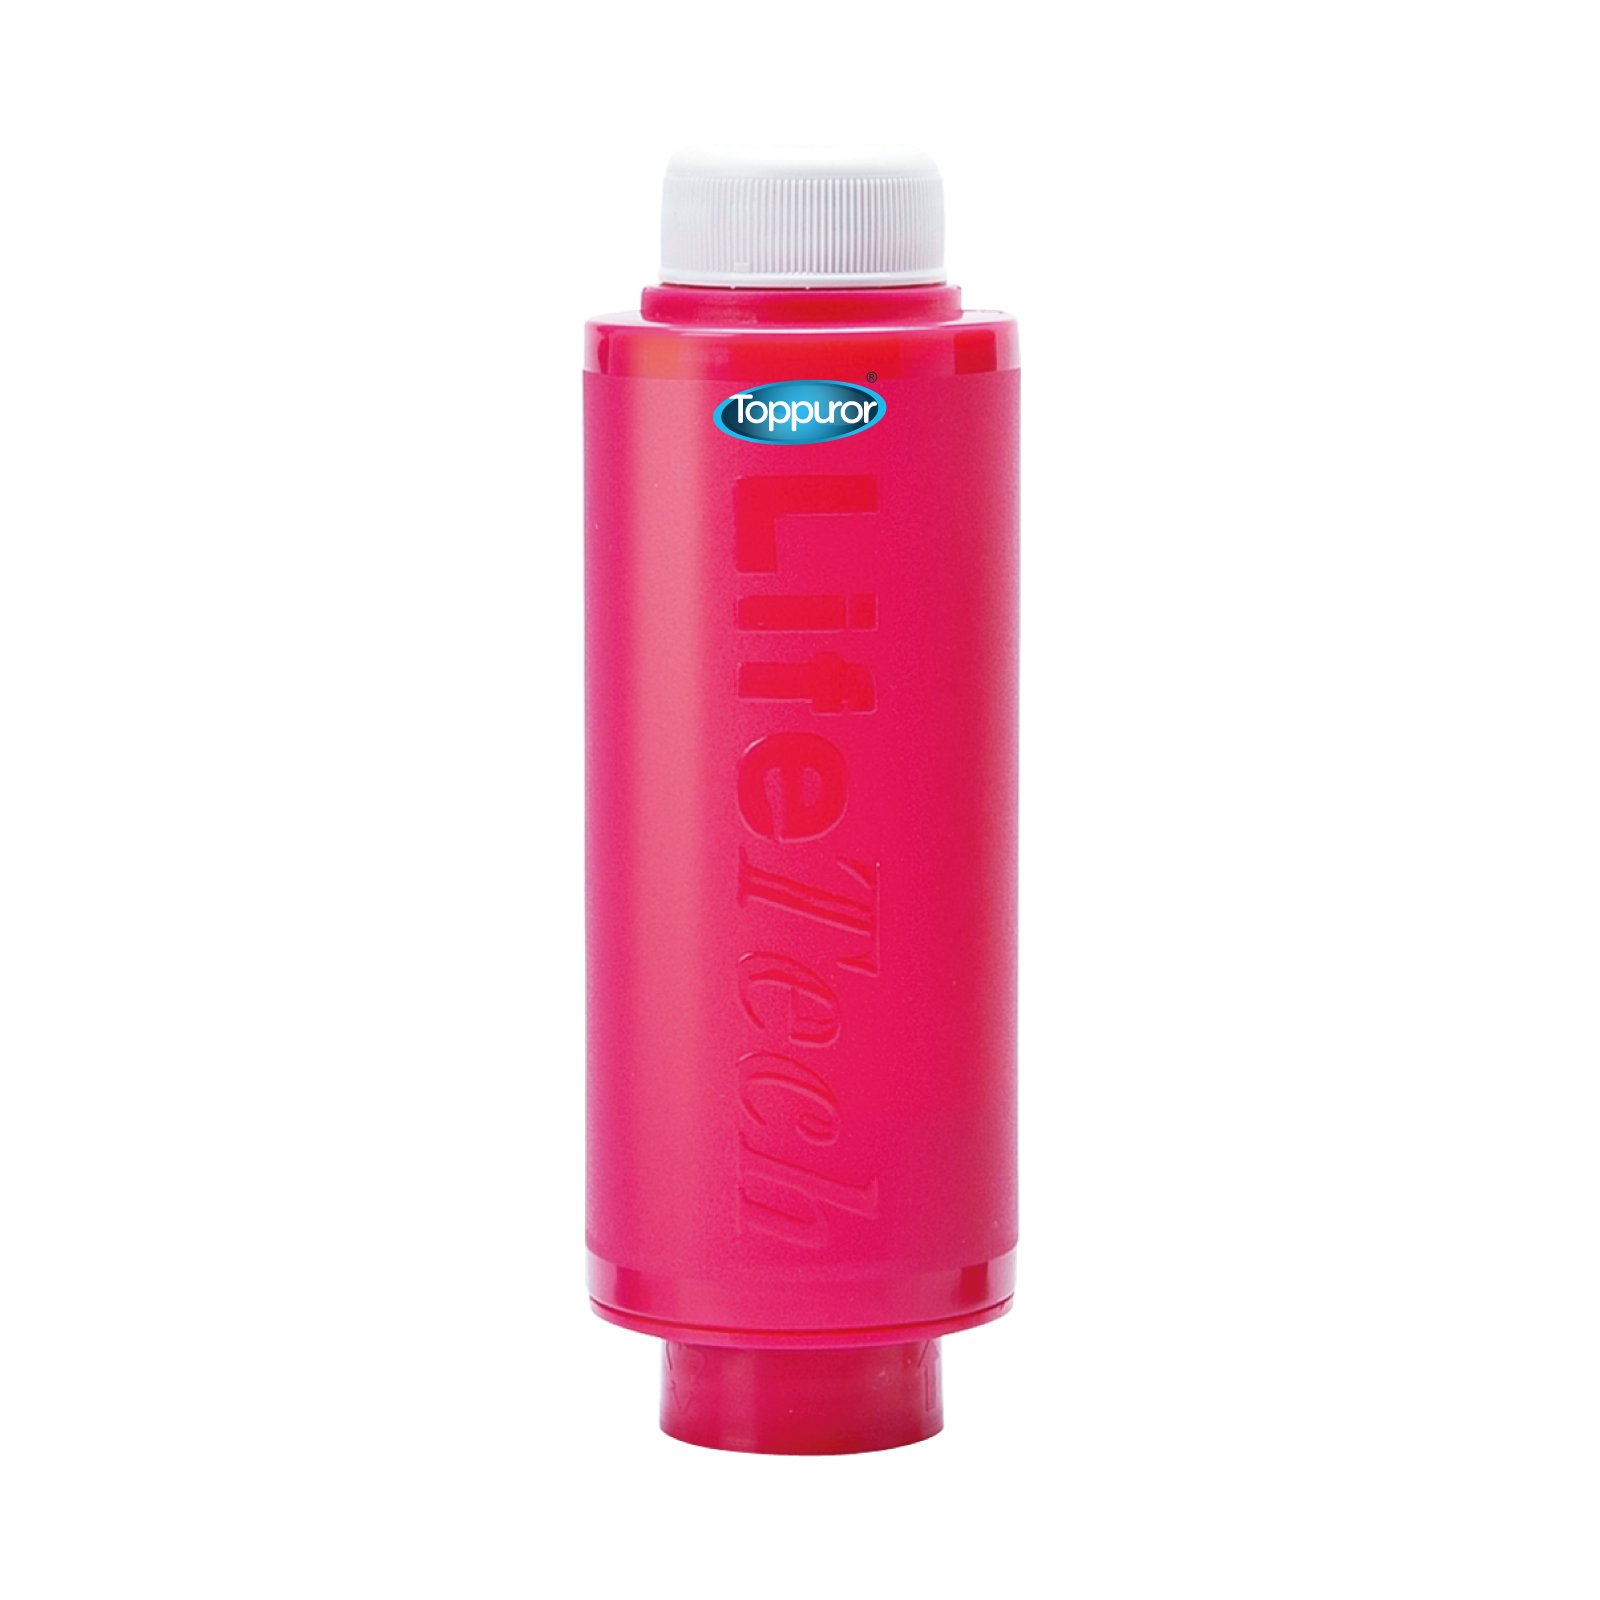 Toppuror Fuschia Ultrafiltration membrane straw - Portable Mineral Filter, suitable for travel, mountain climbing, school, home , hotel, hostel